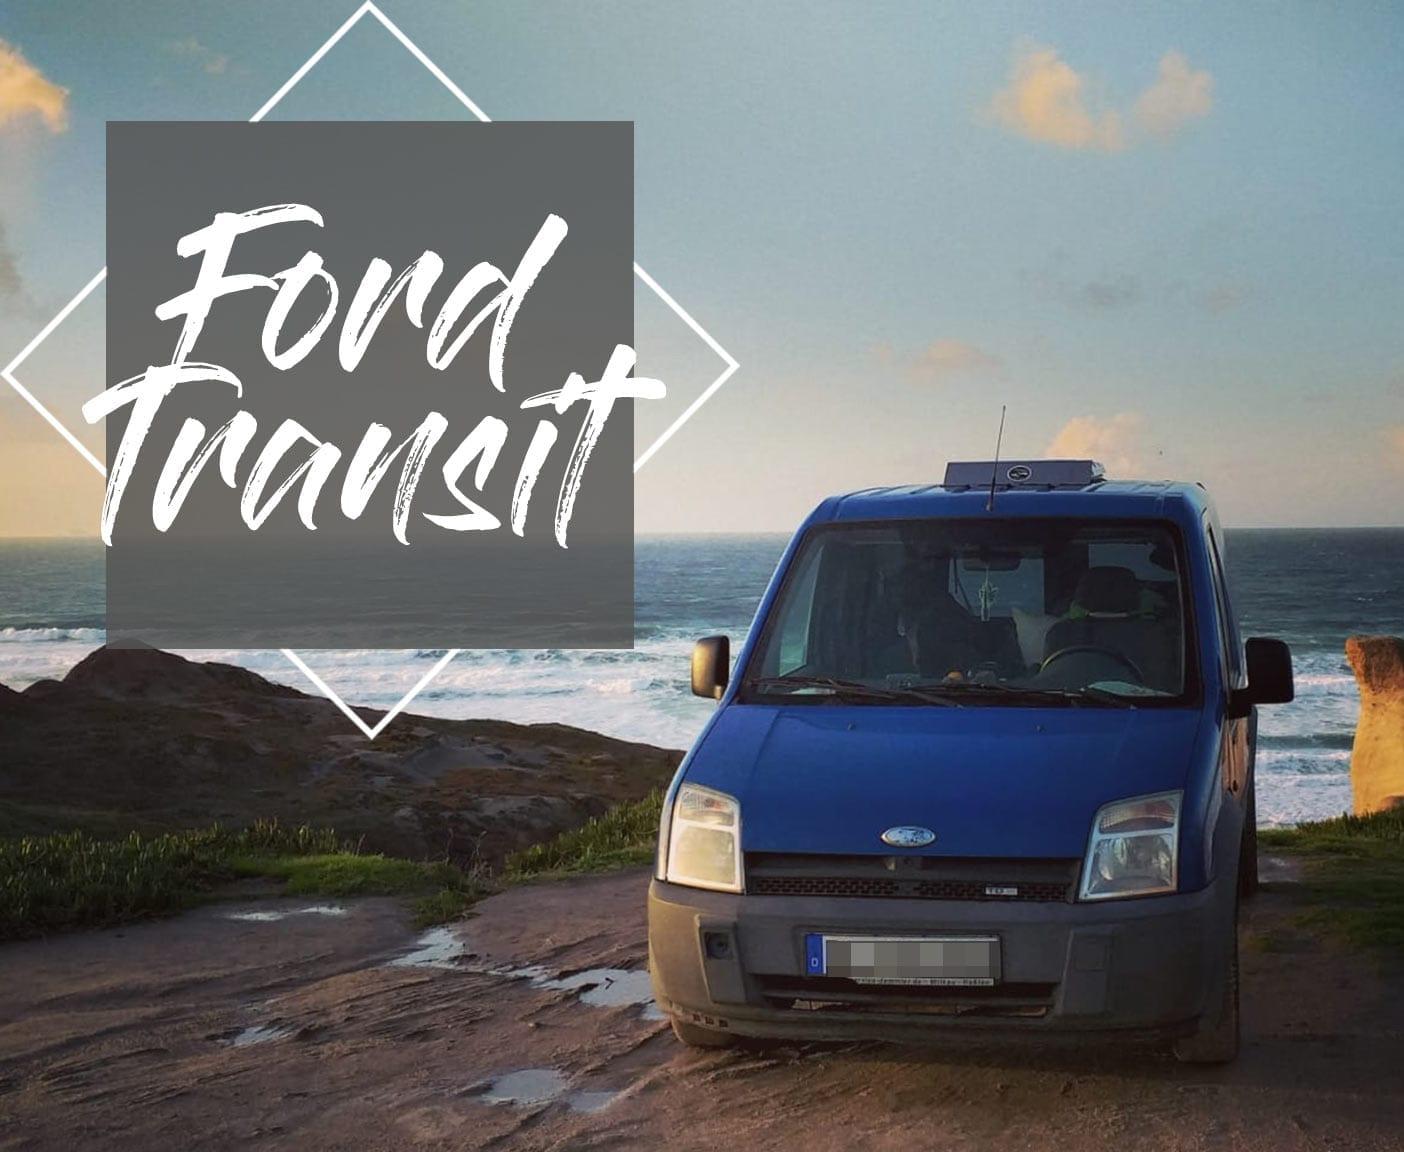 Ford-transit-connect-ladeflÑche-camper-l2-test-frei-stehen-van